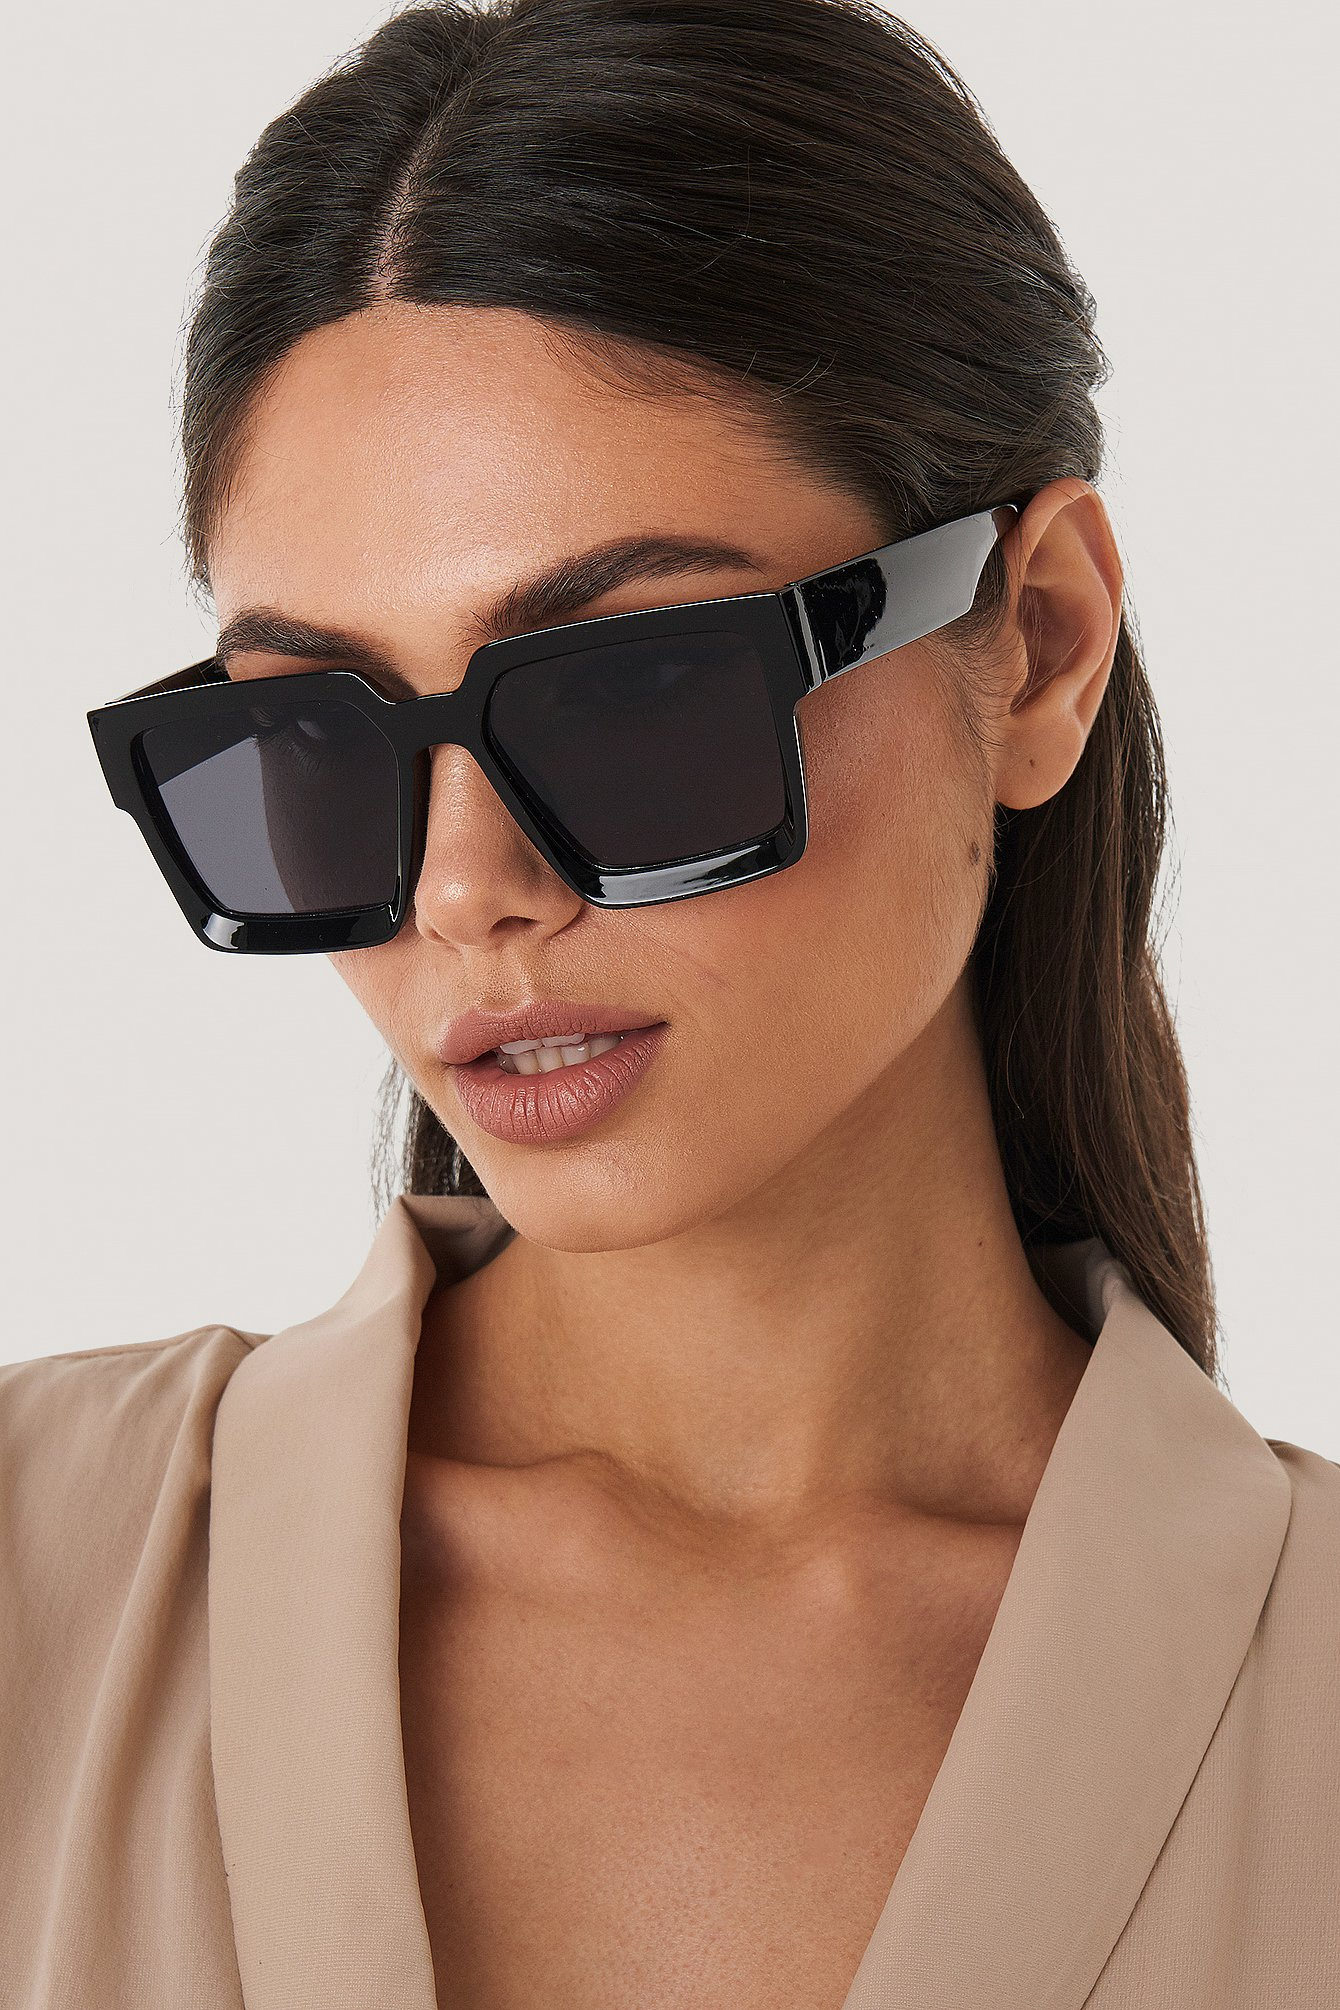 NA-KD Accessories Big Squared Edge Sunglasses - Black   Accessoires > Sonnenbrillen > Sonstige Sonnenbrillen   NA-KD Accessories